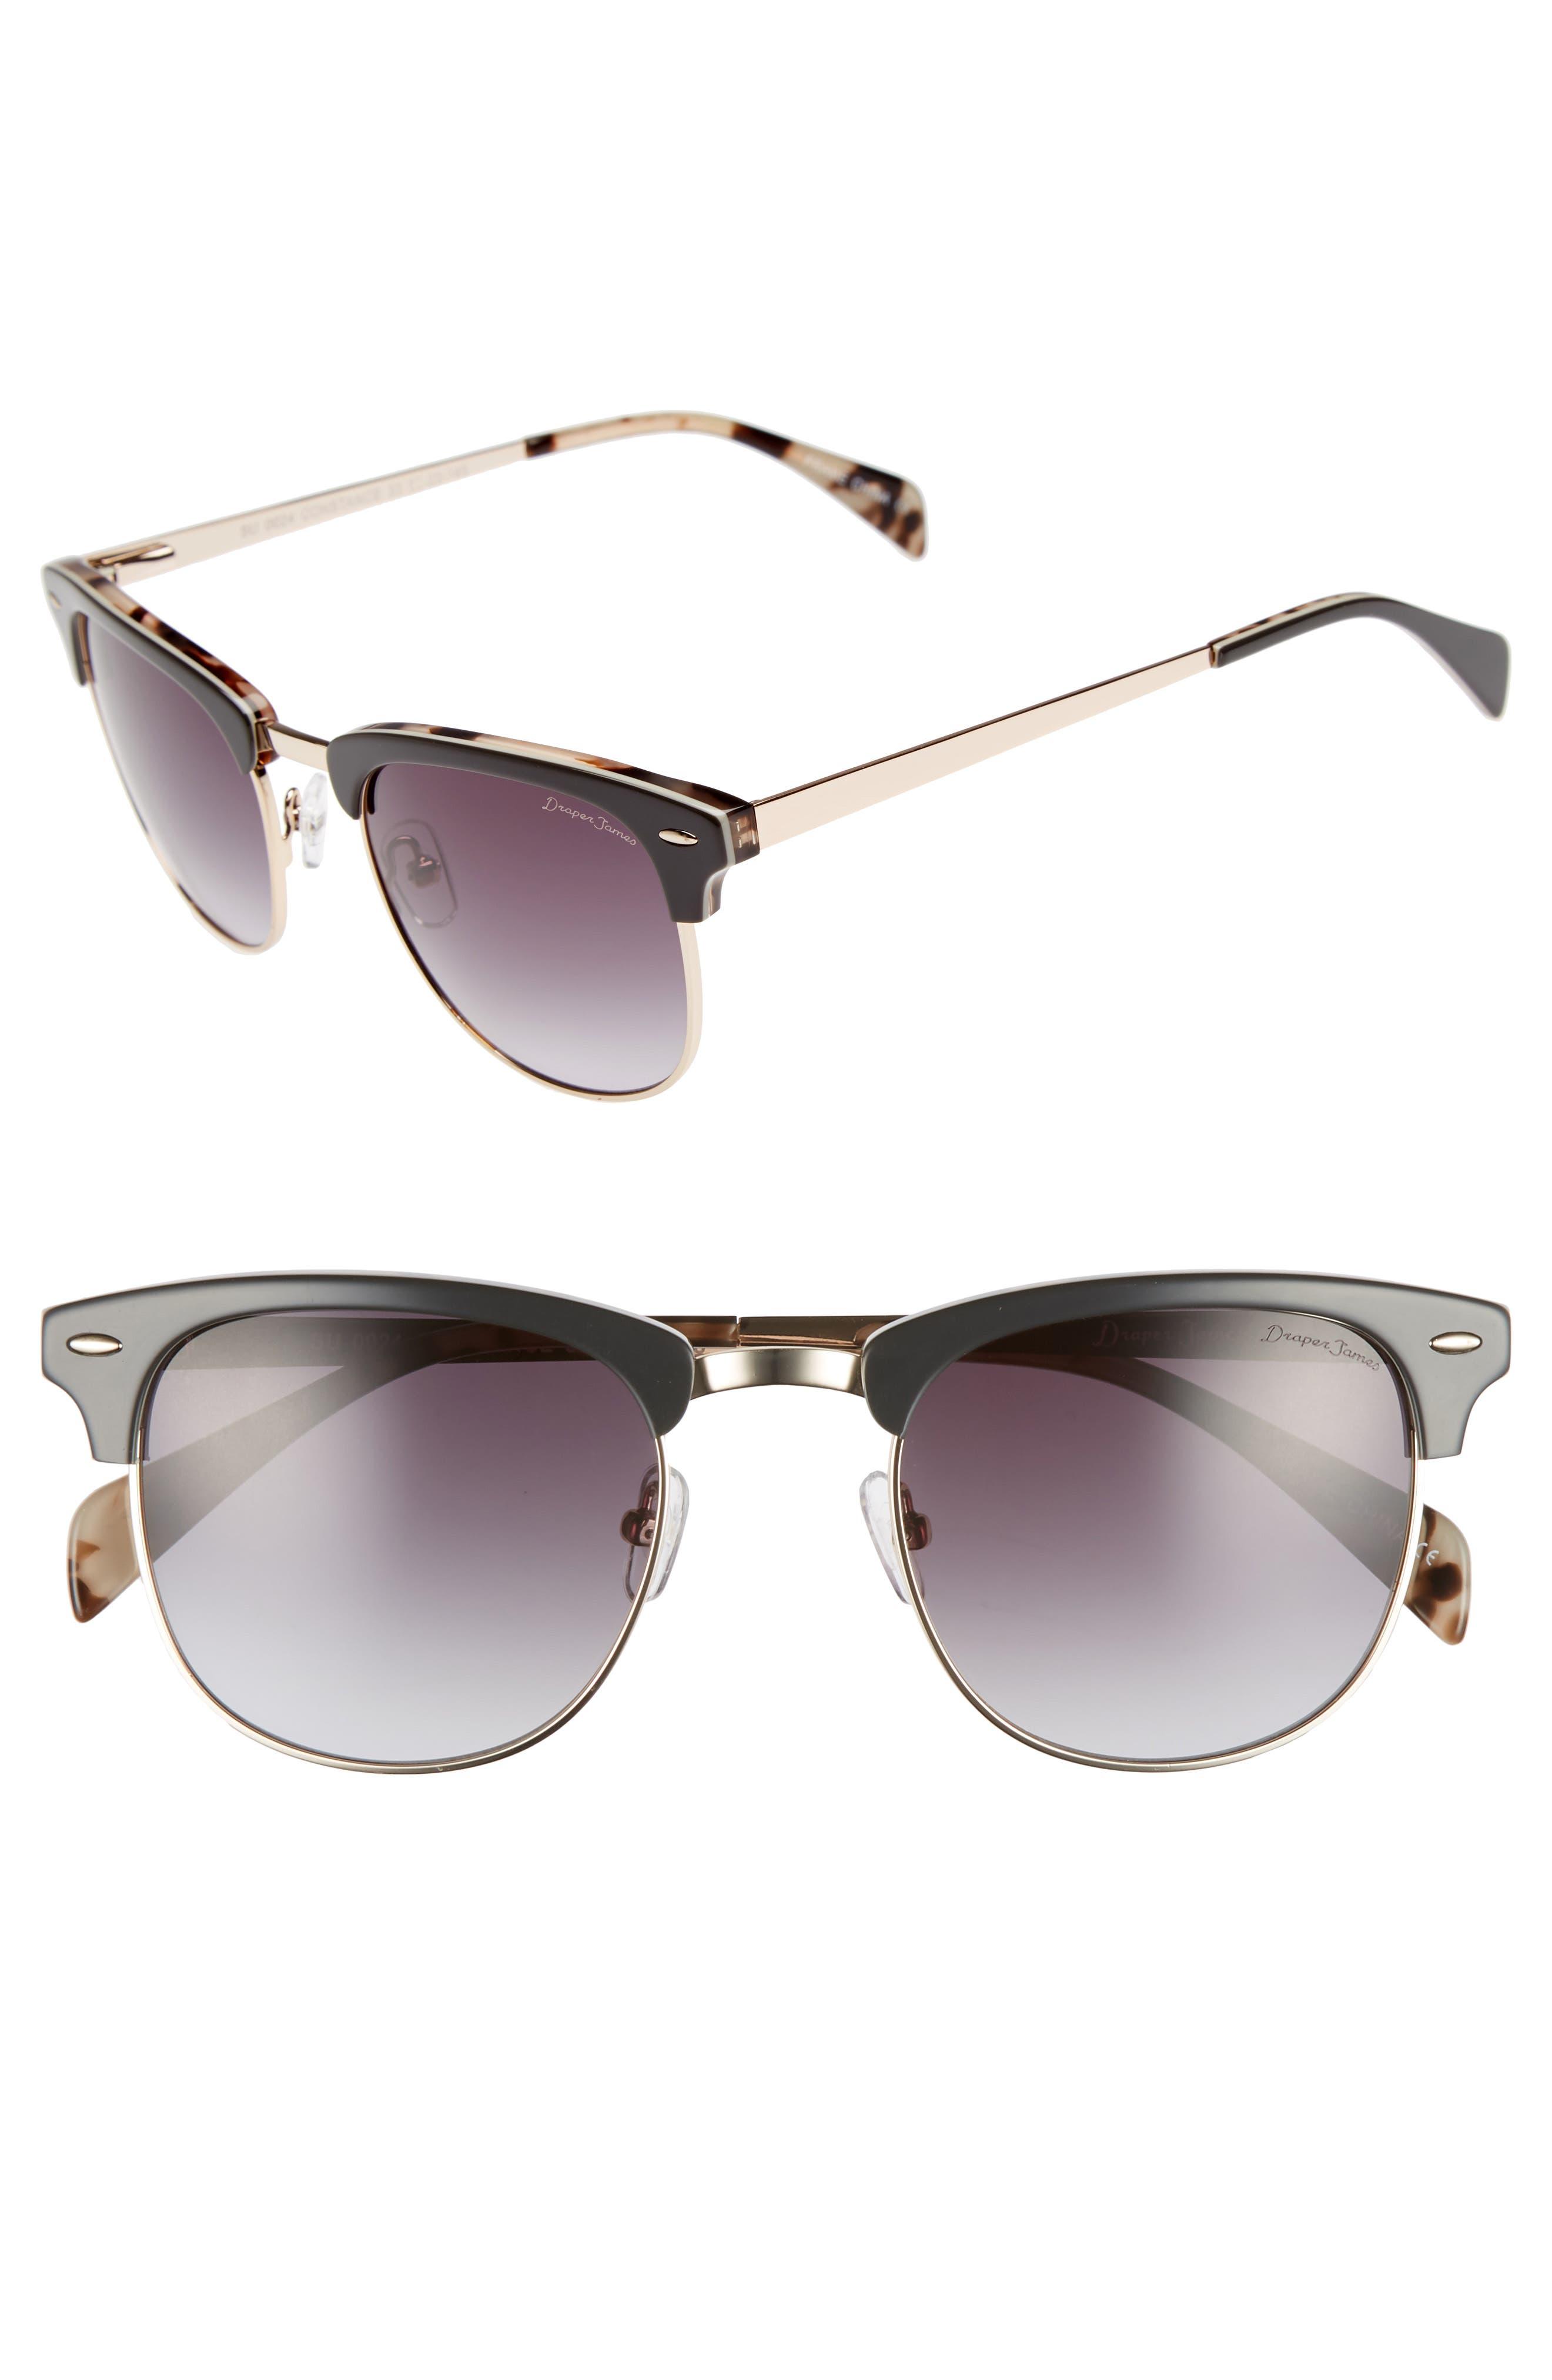 55mm Sunglasses,                         Main,                         color, GREY